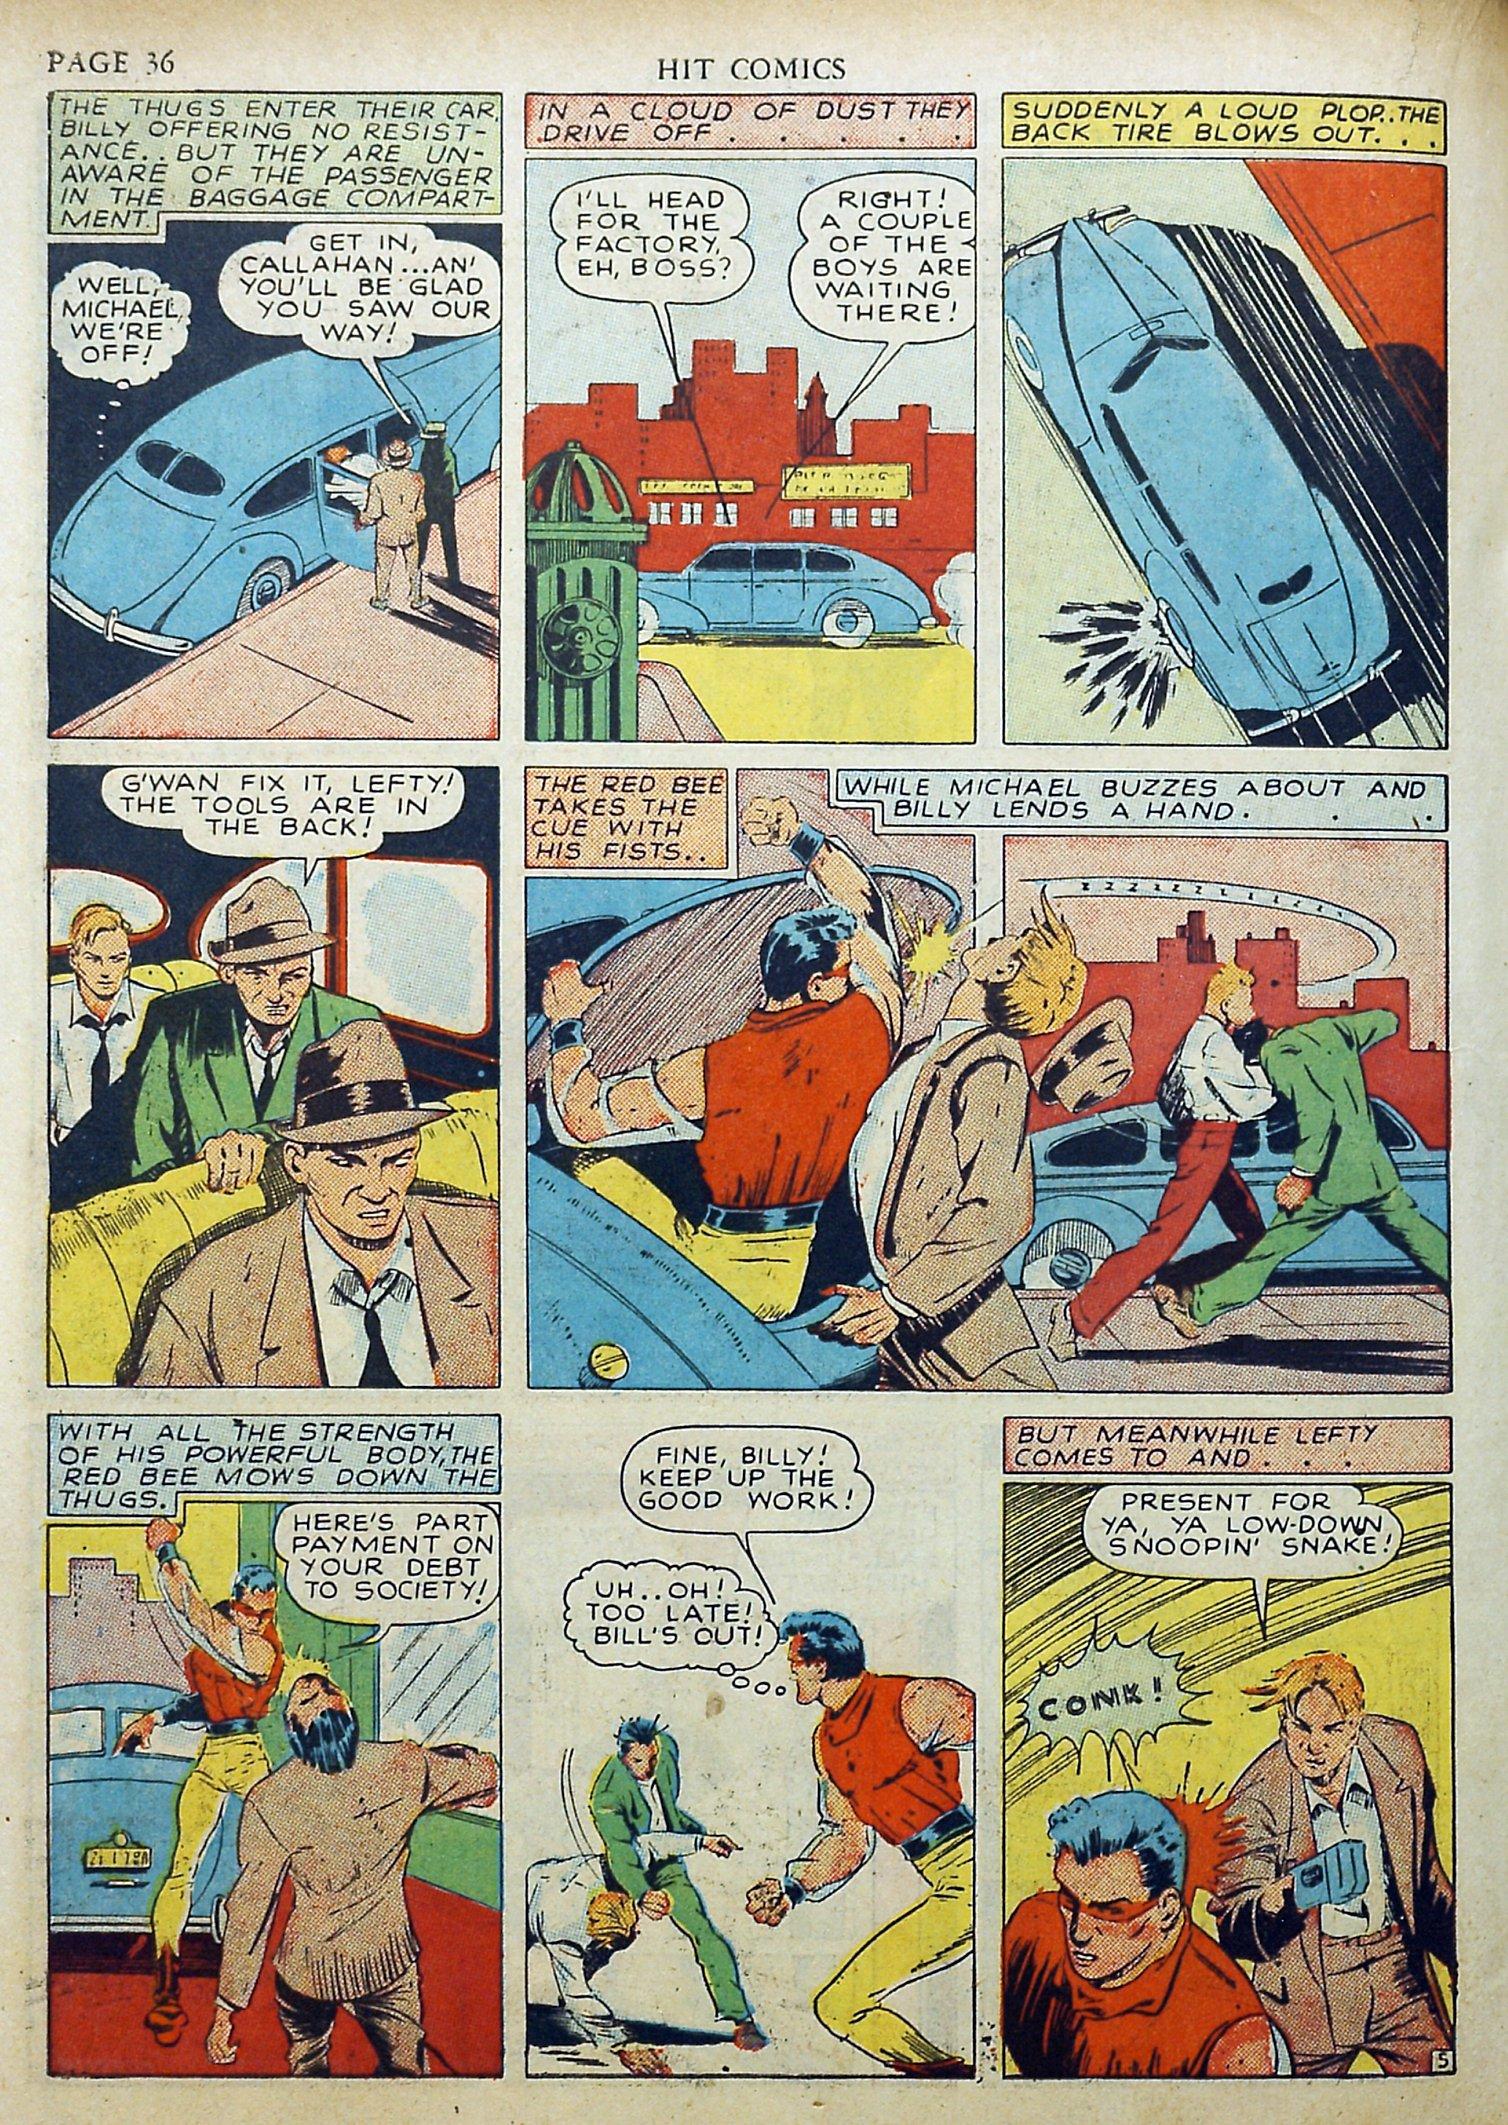 Read online Hit Comics comic -  Issue #17 - 38